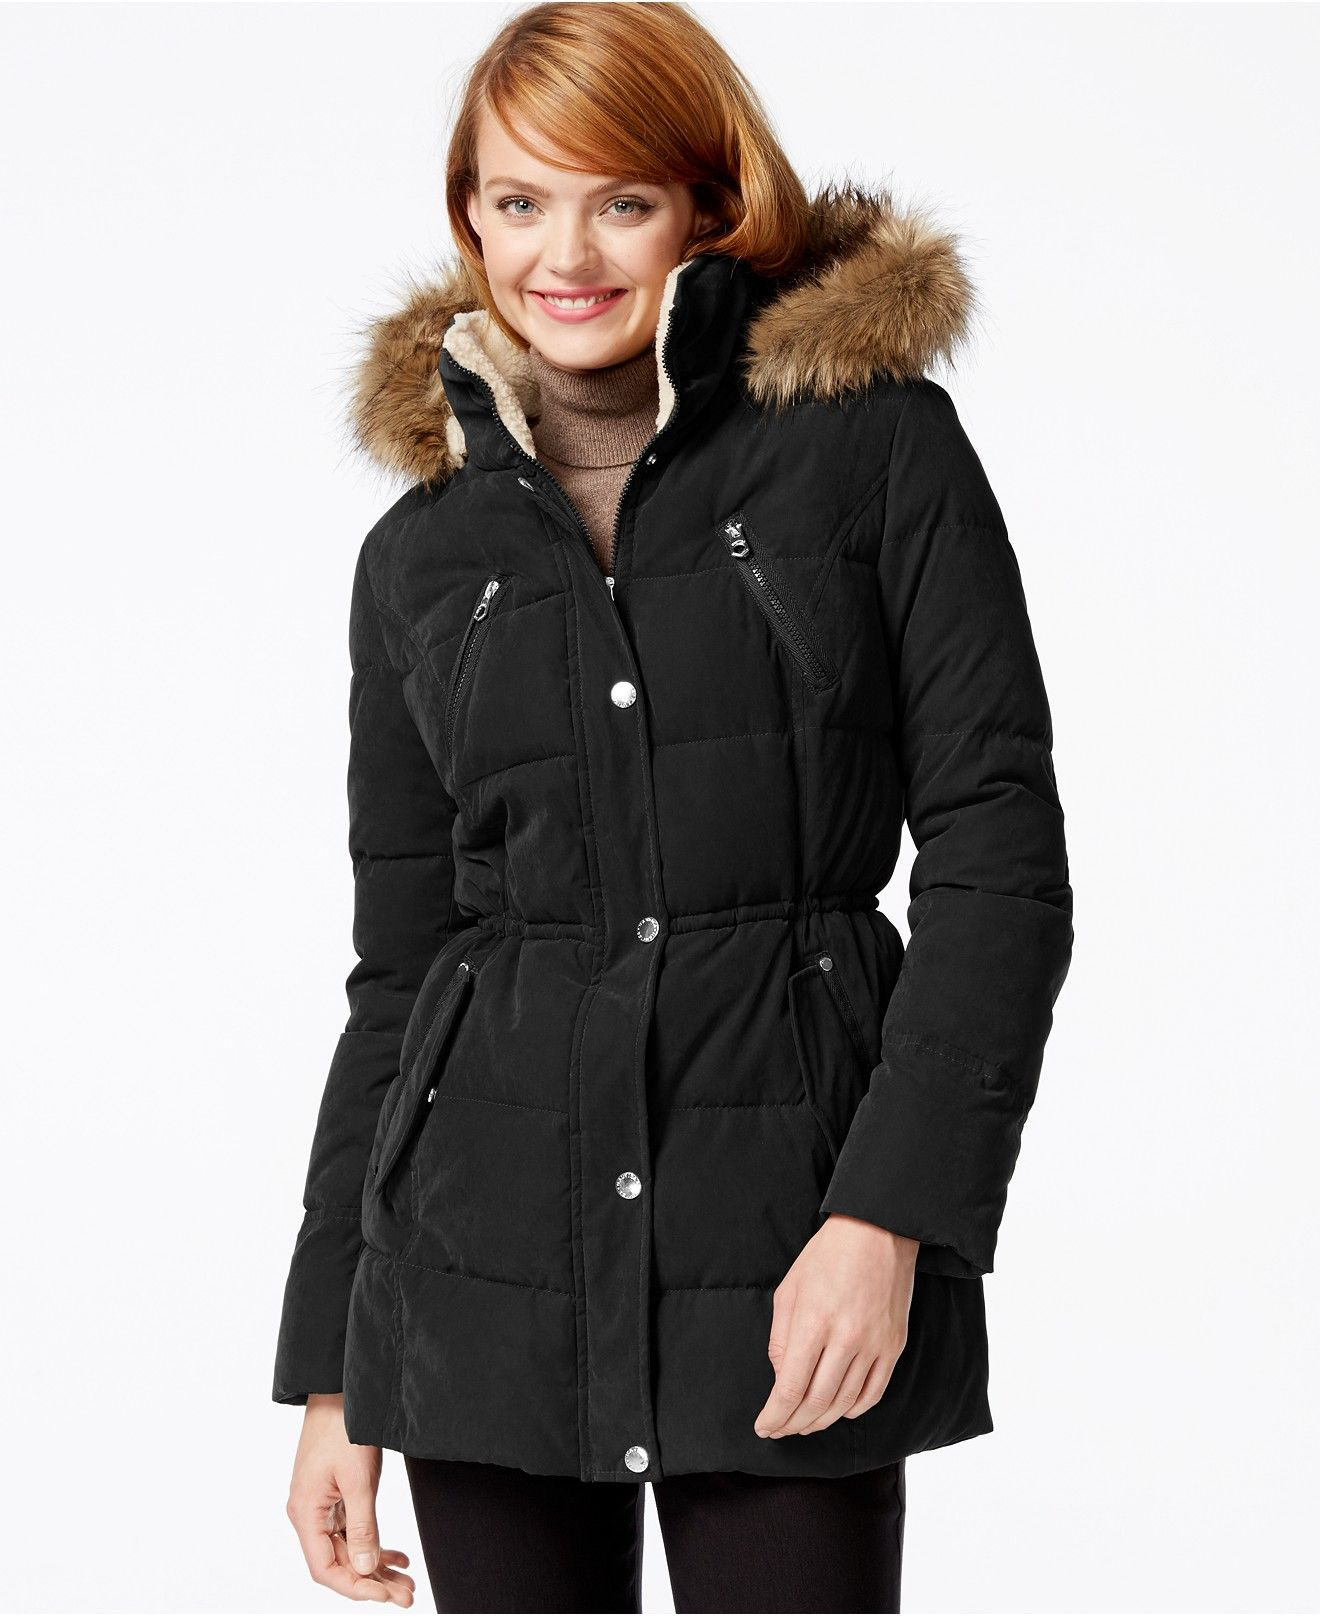 Nautica Faux Fur Trim Microfiber Parka Coats Women Macy S Coats For Women Clothes Design Fur Trim [ 1616 x 1320 Pixel ]